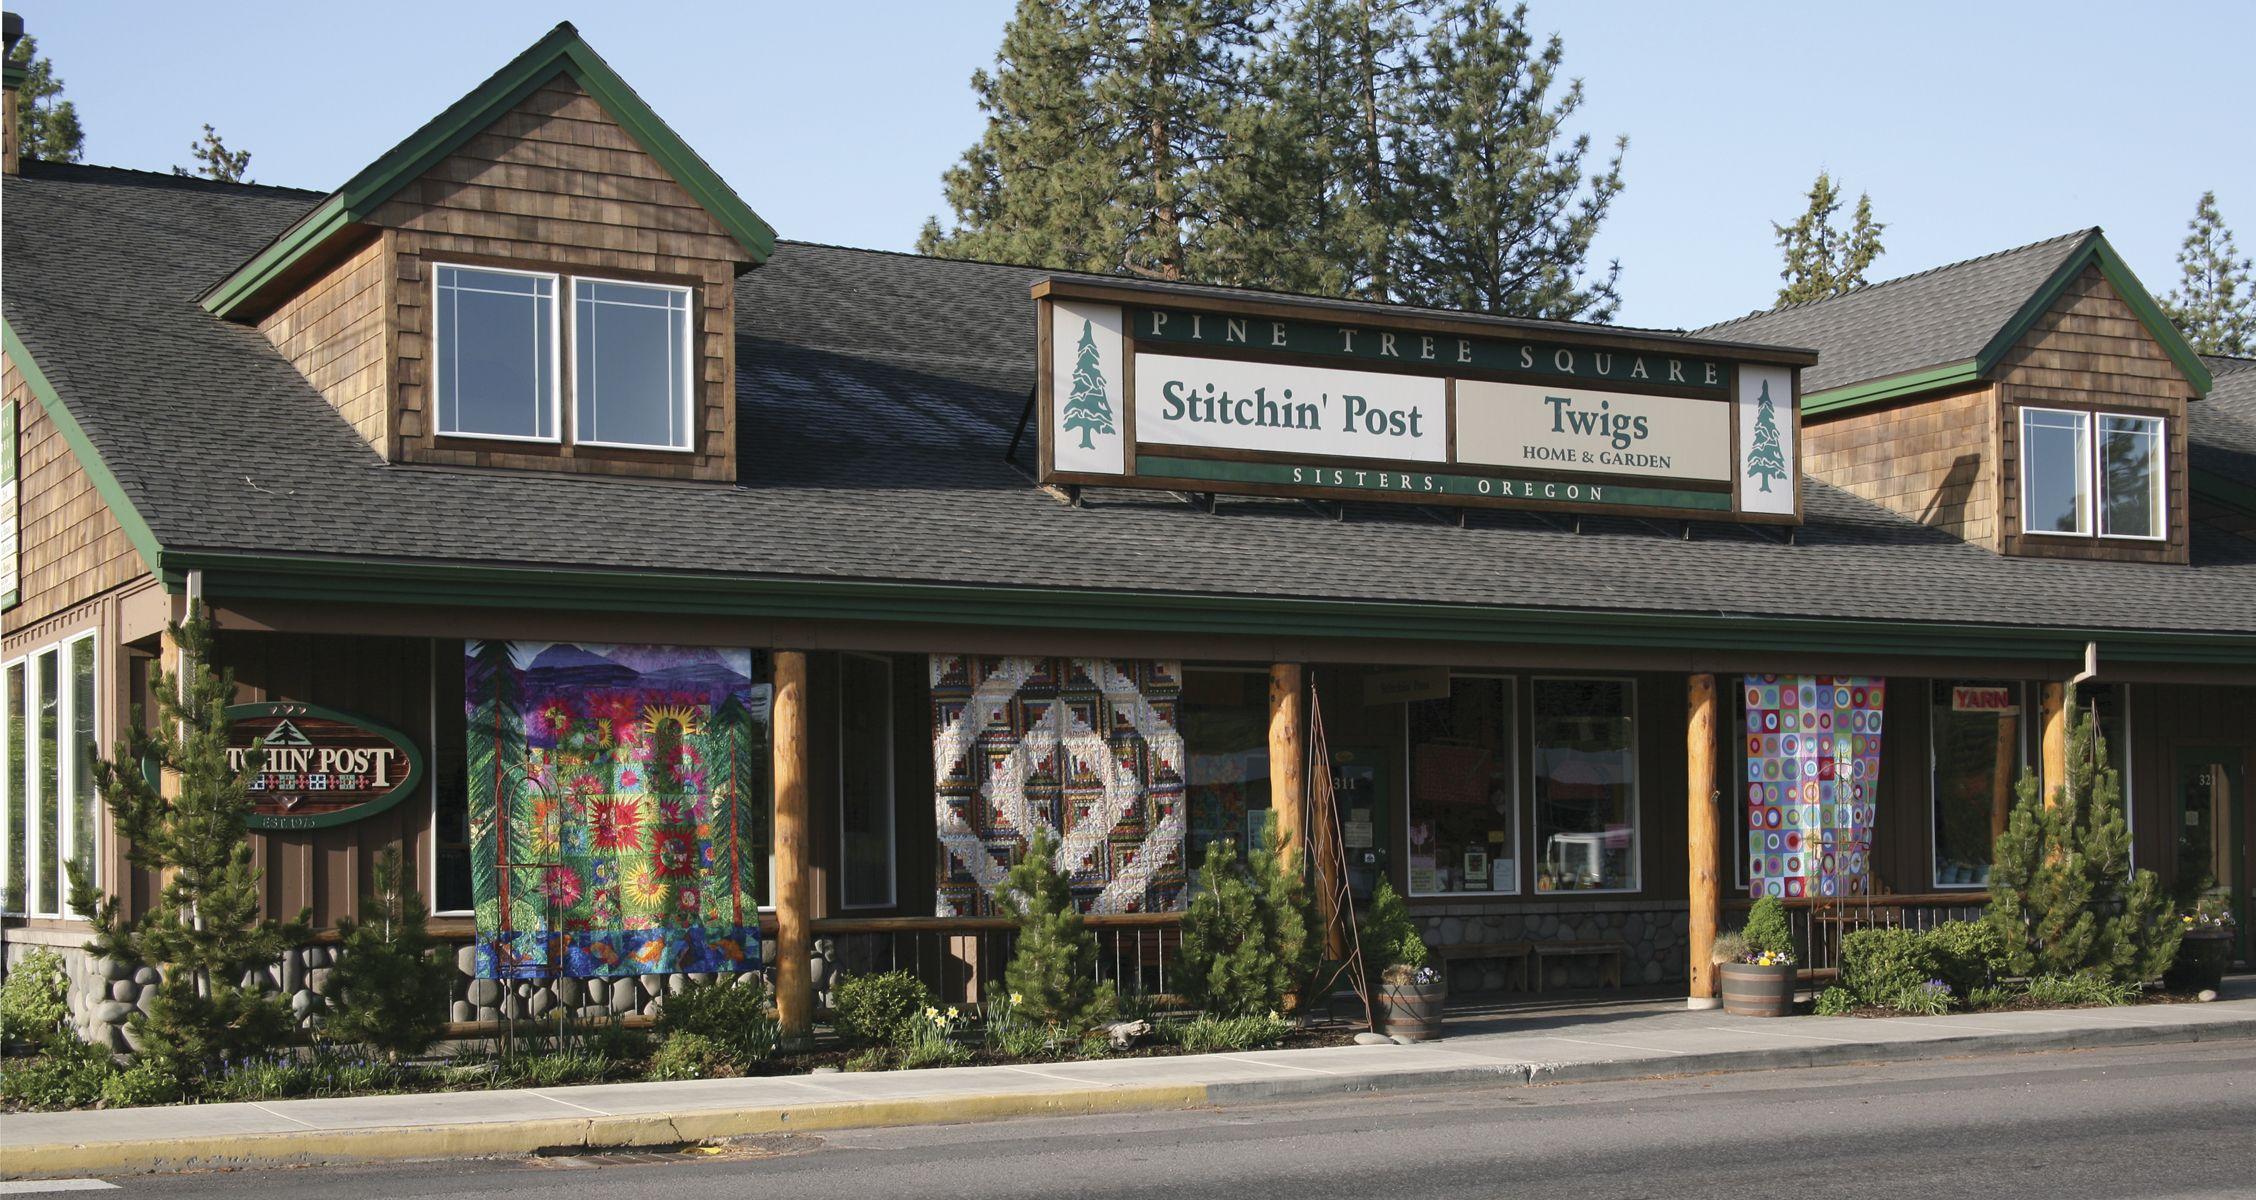 Sisters, Oregon. The Stitching Post quilt shop where there is an ... : quilt shop sisters oregon - Adamdwight.com